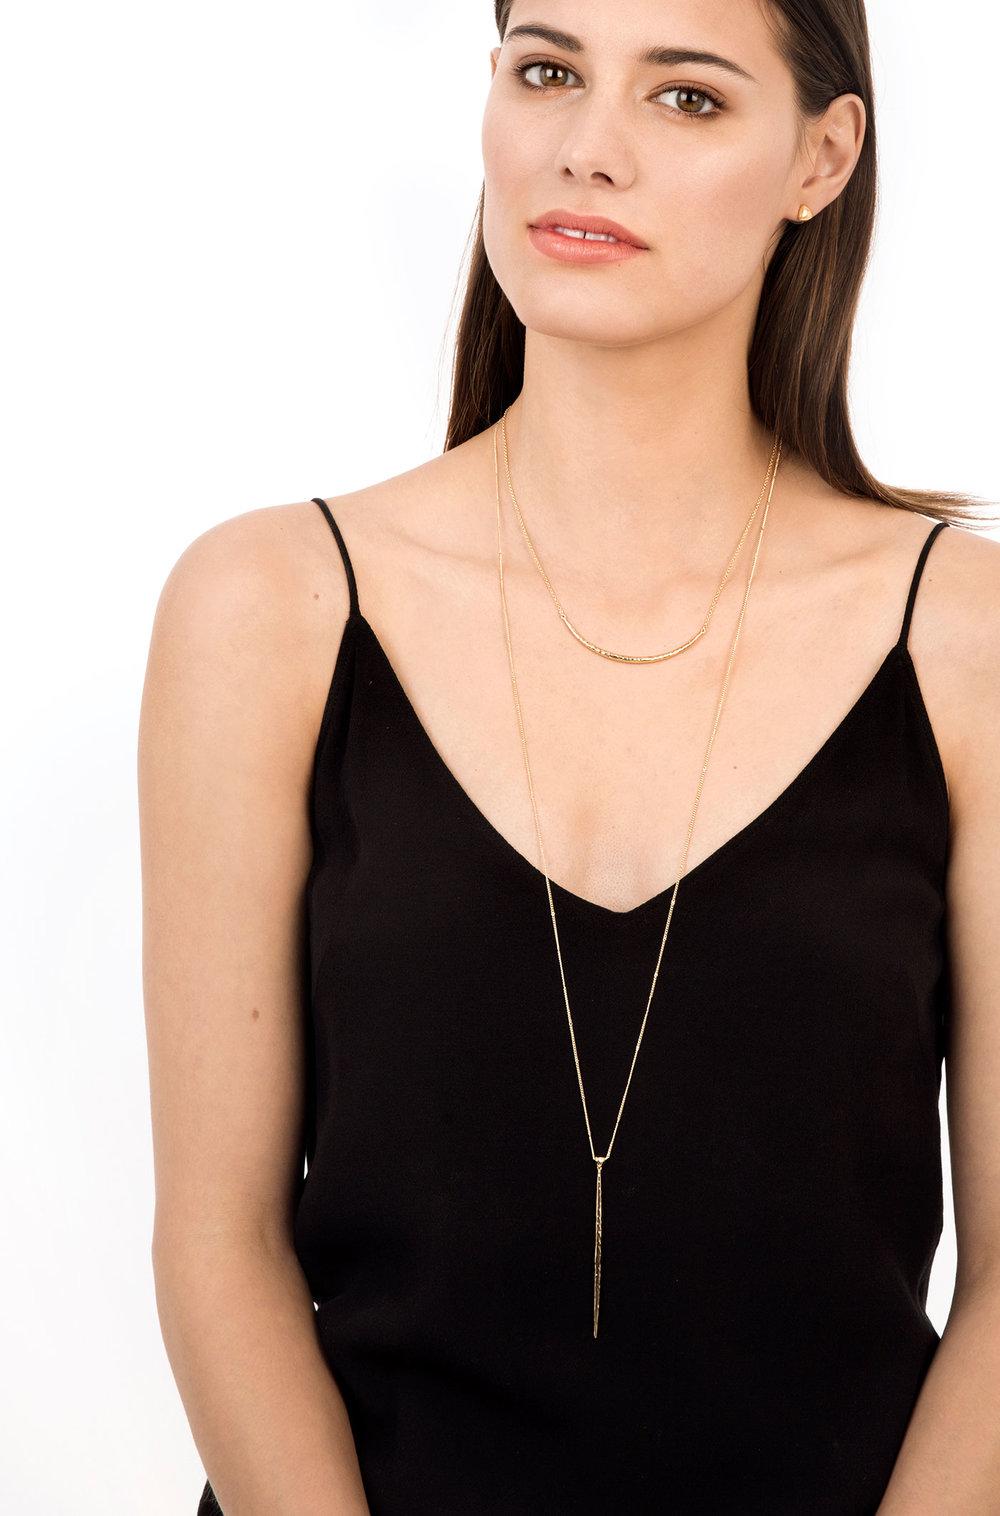 Kari Layered Necklace $59